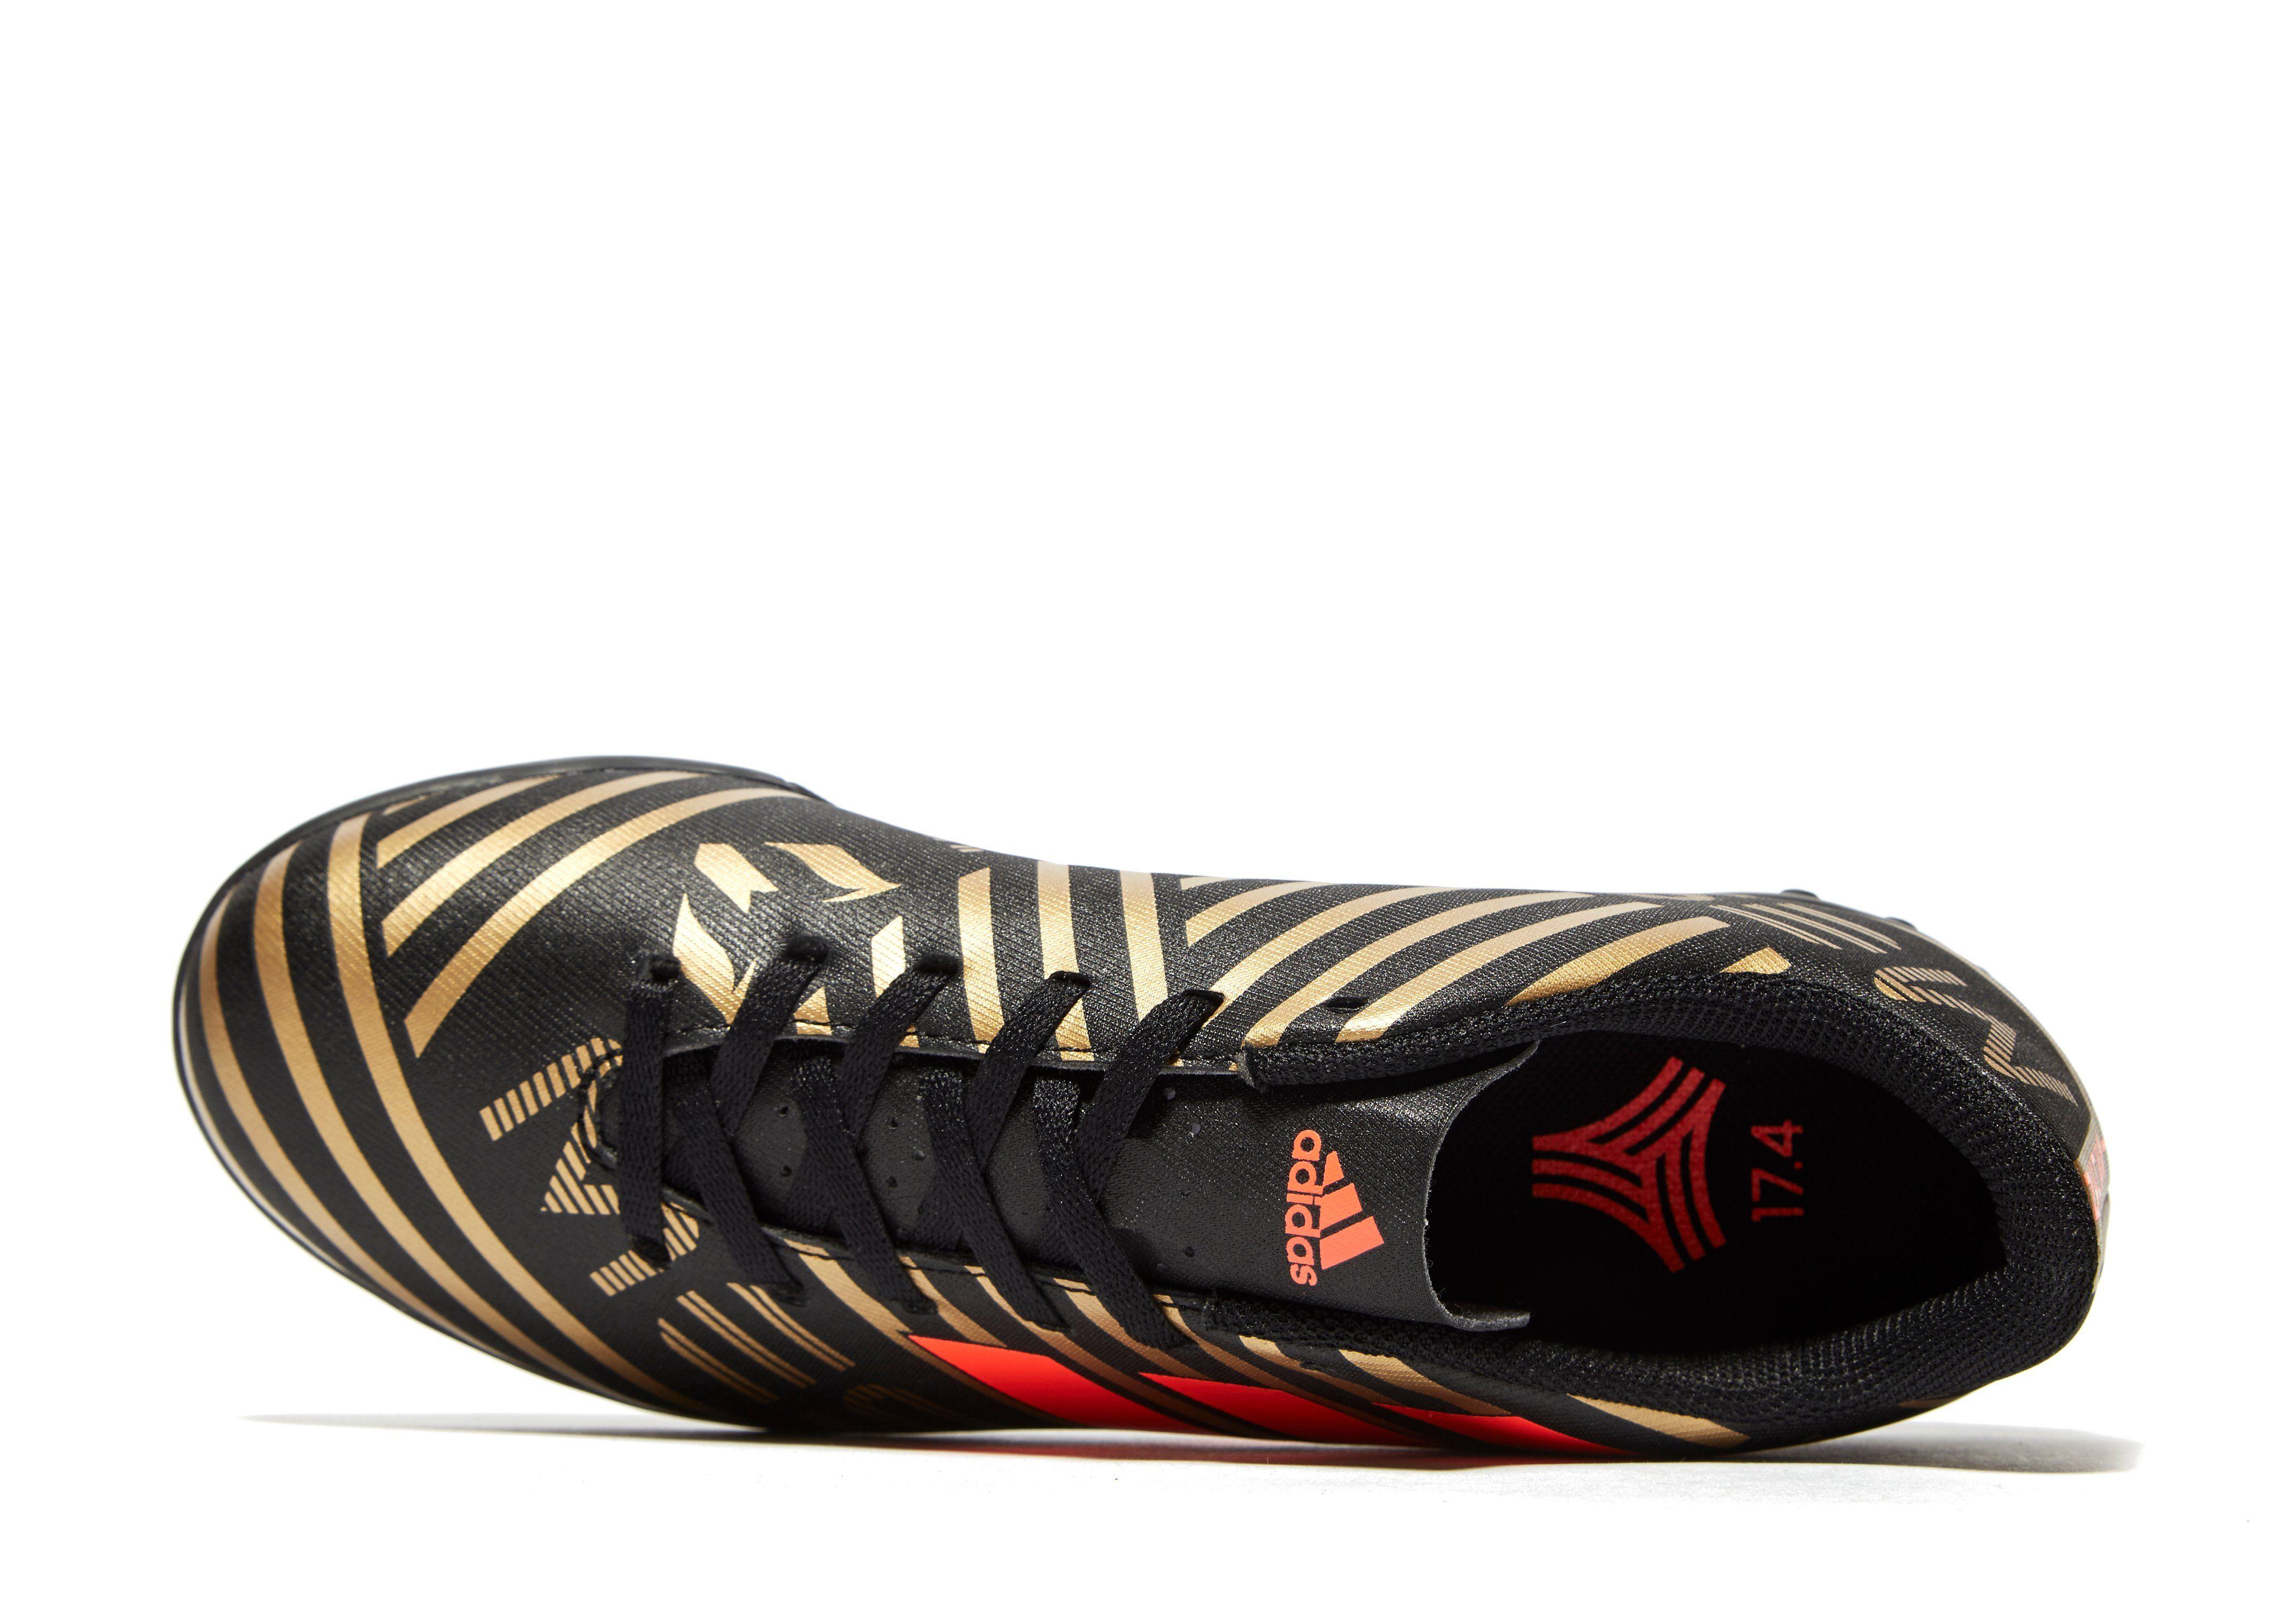 Adidas Nemeziz 18.4 Messi TF Bambino